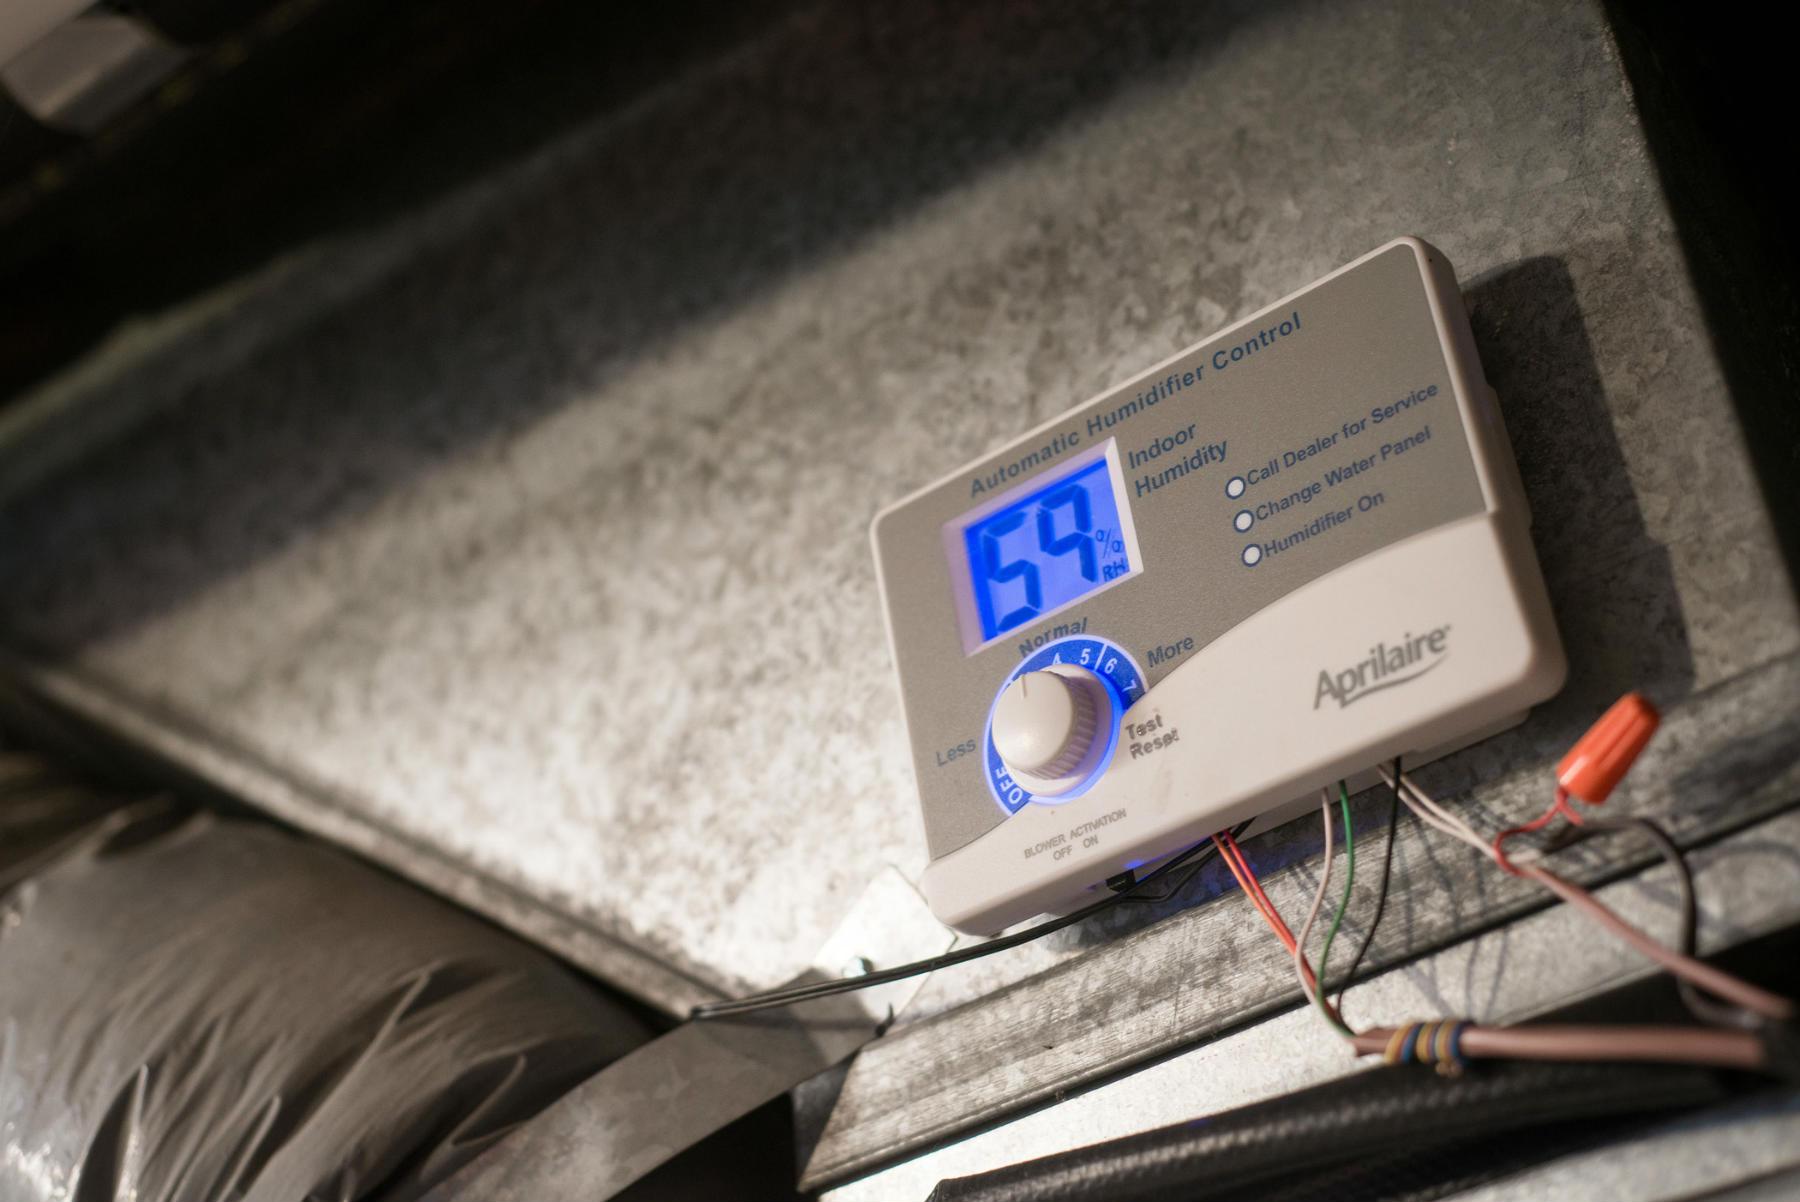 binder-home-humidifier-installation.jpg